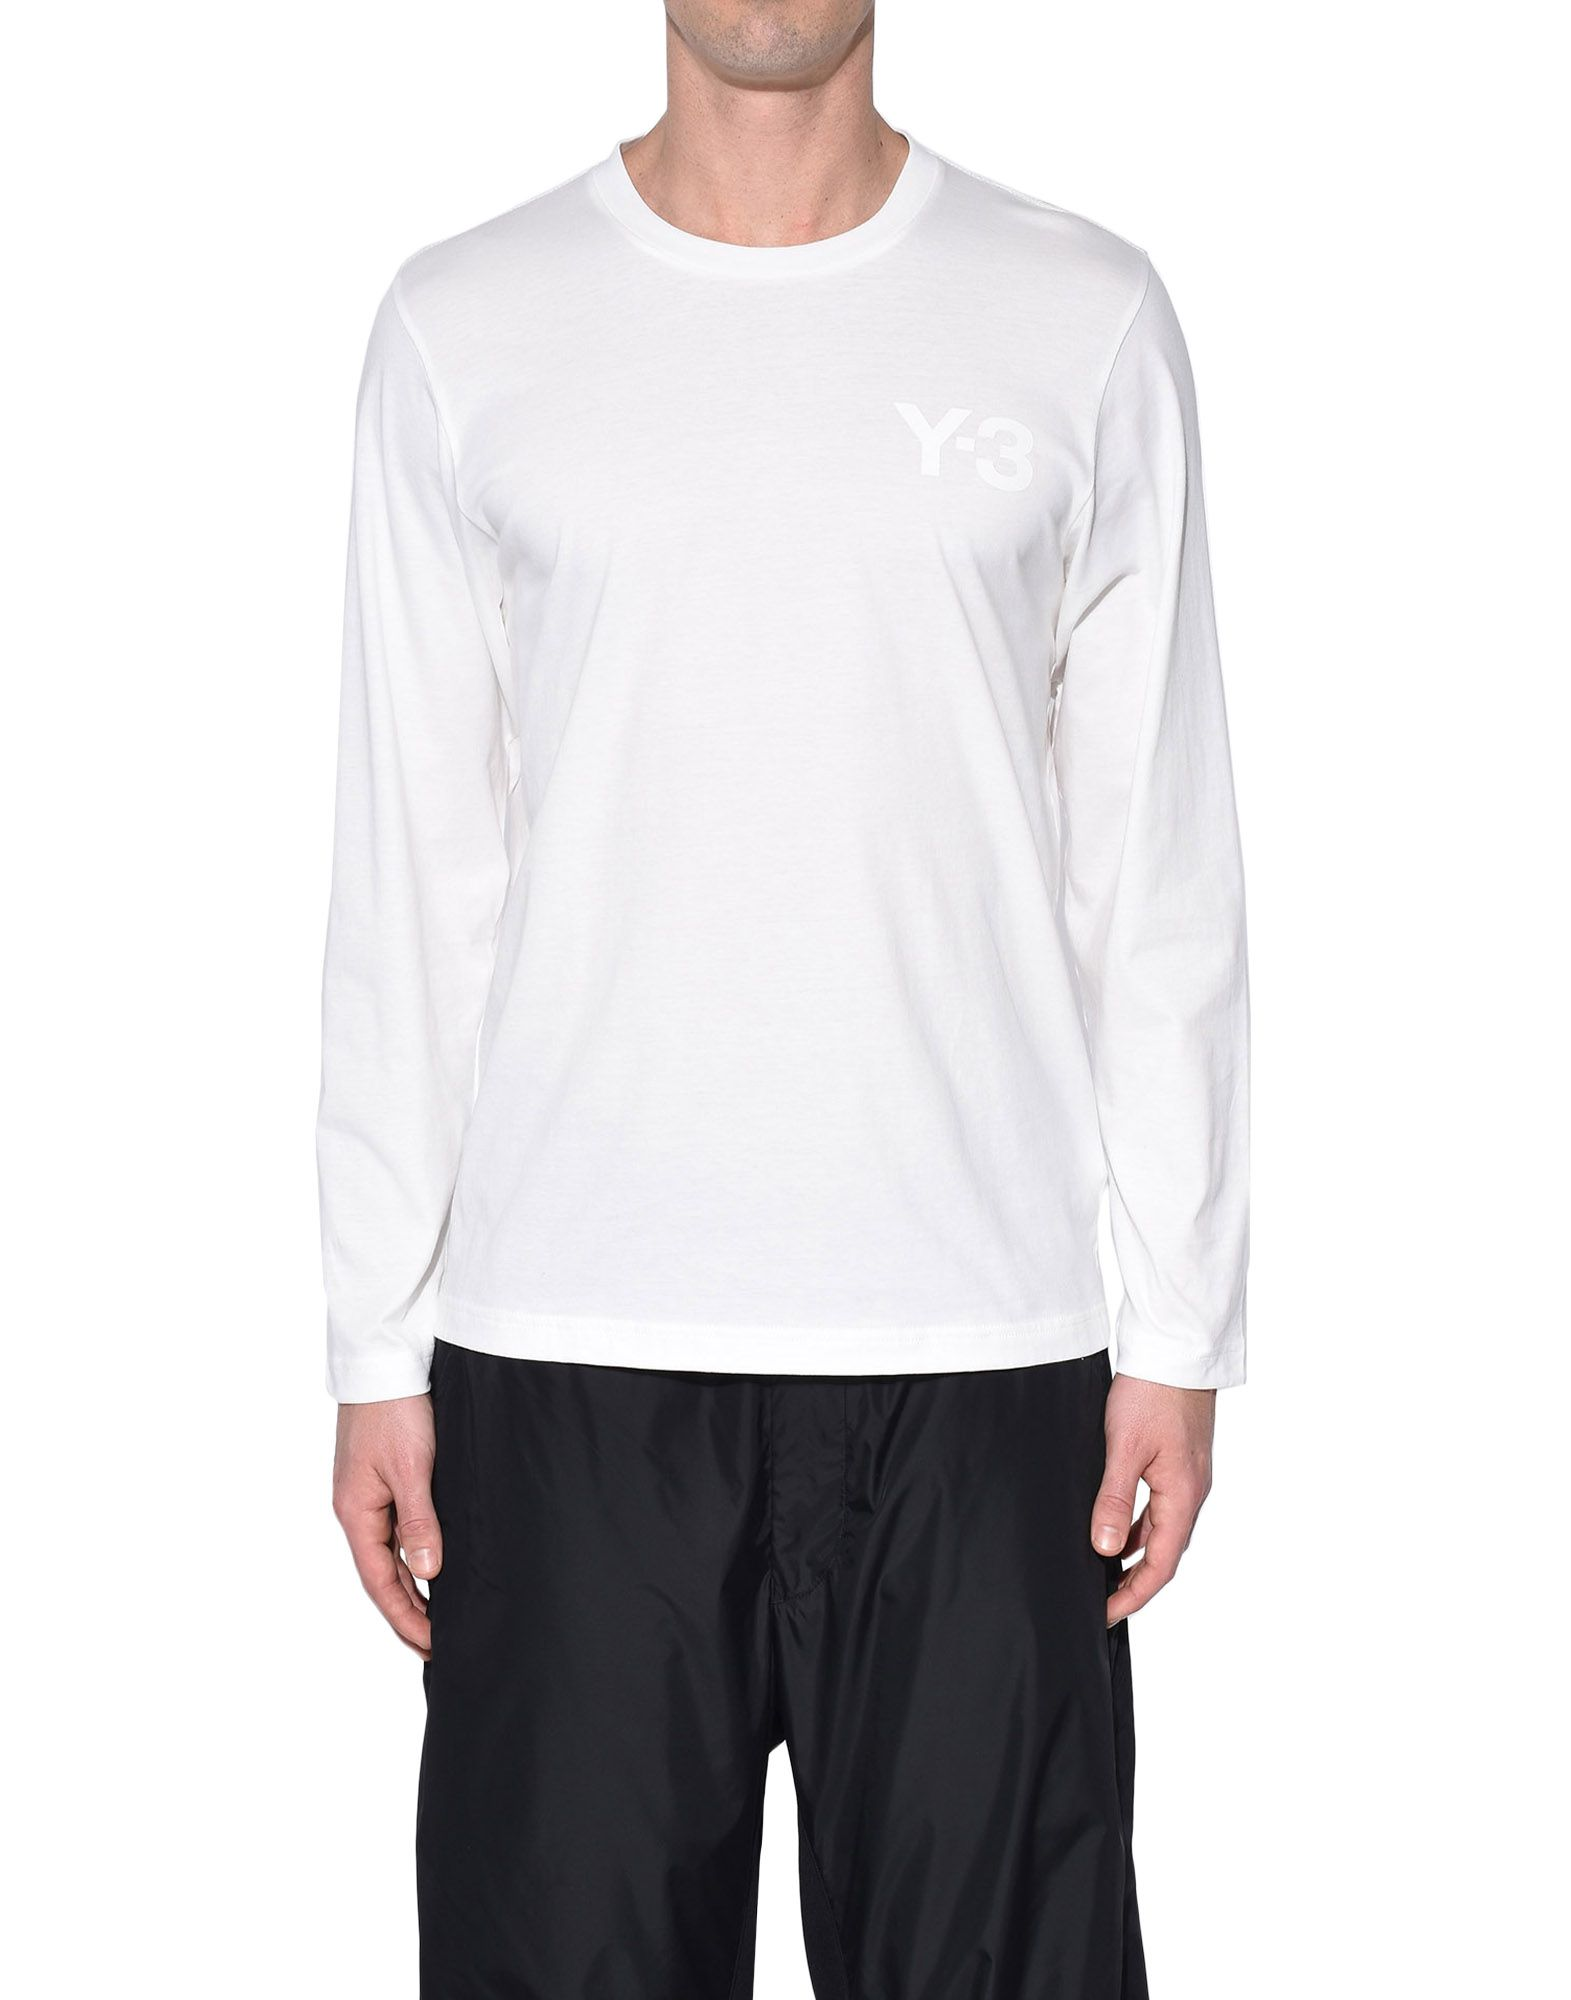 Y-3 Y-3 Classic Tee Long sleeve t-shirt Man r